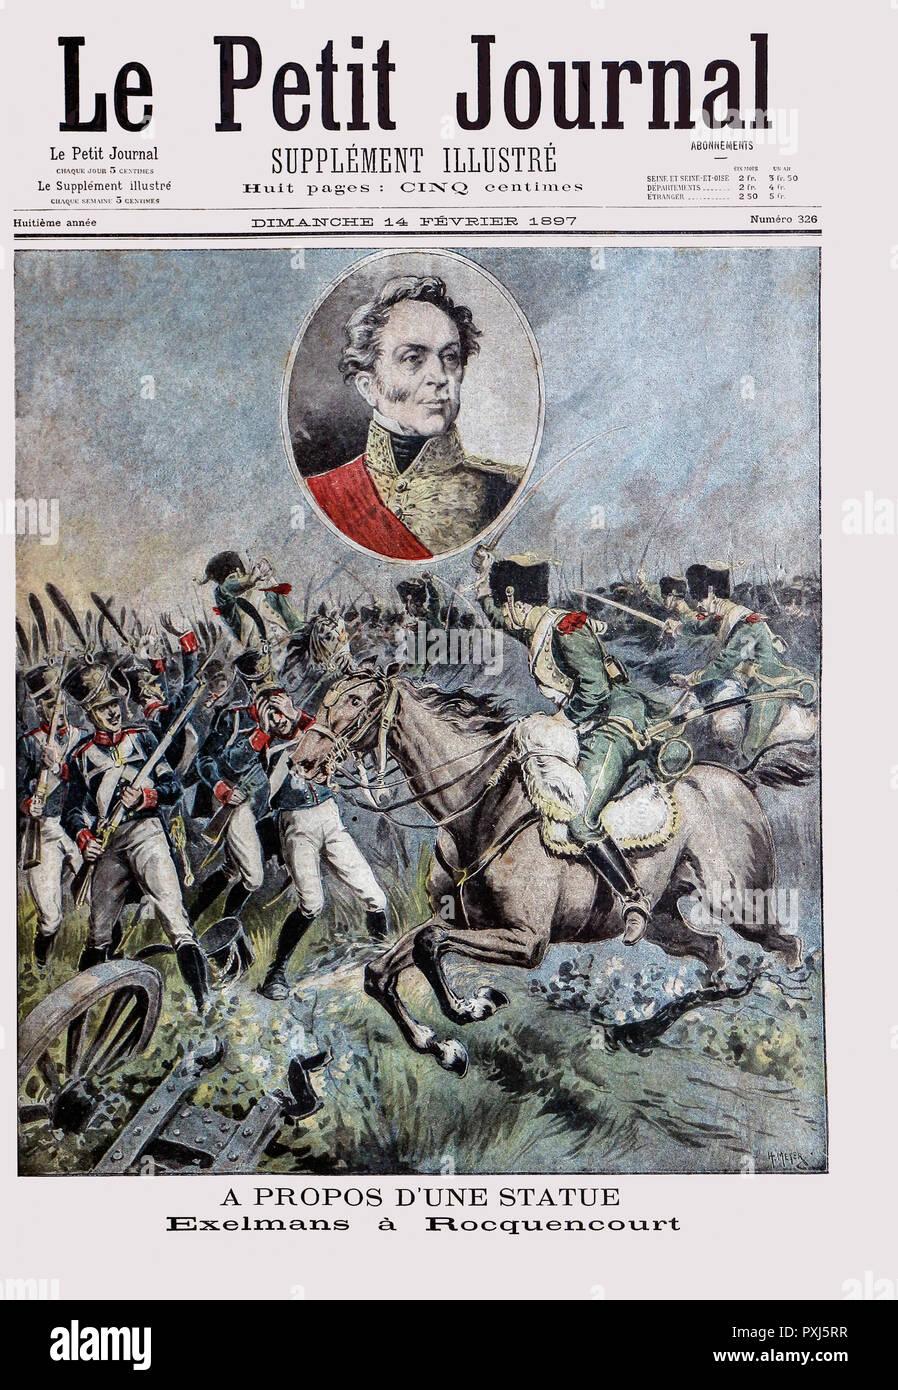 Le Petit Journal - Stock Image